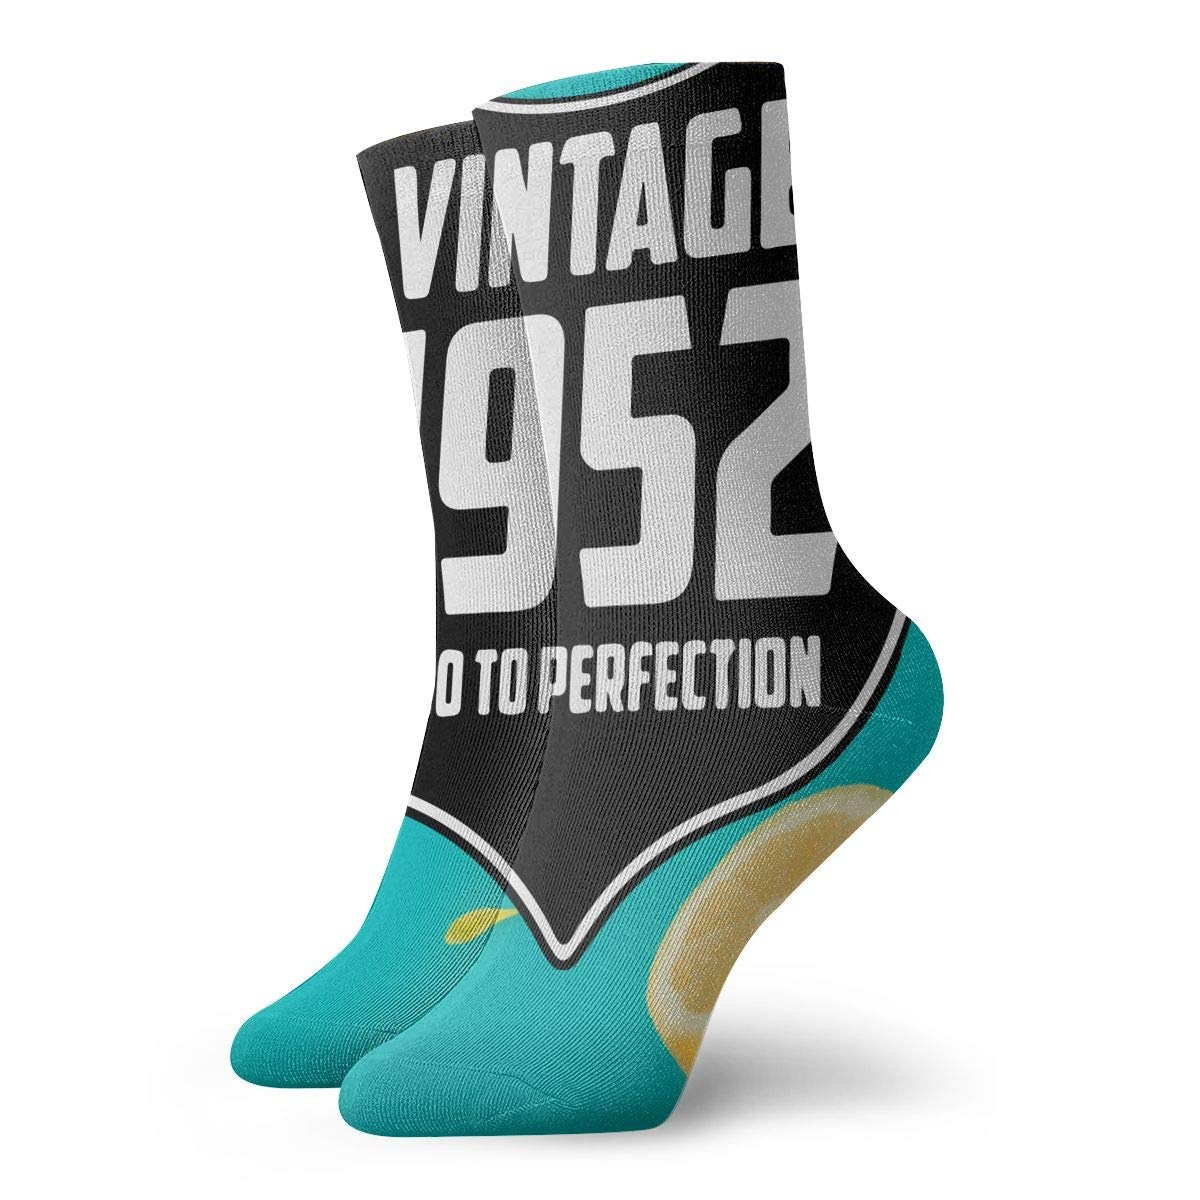 Vintage 1952 Fashion Dress Socks Short Socks Leisure Travel 11.8 Inch